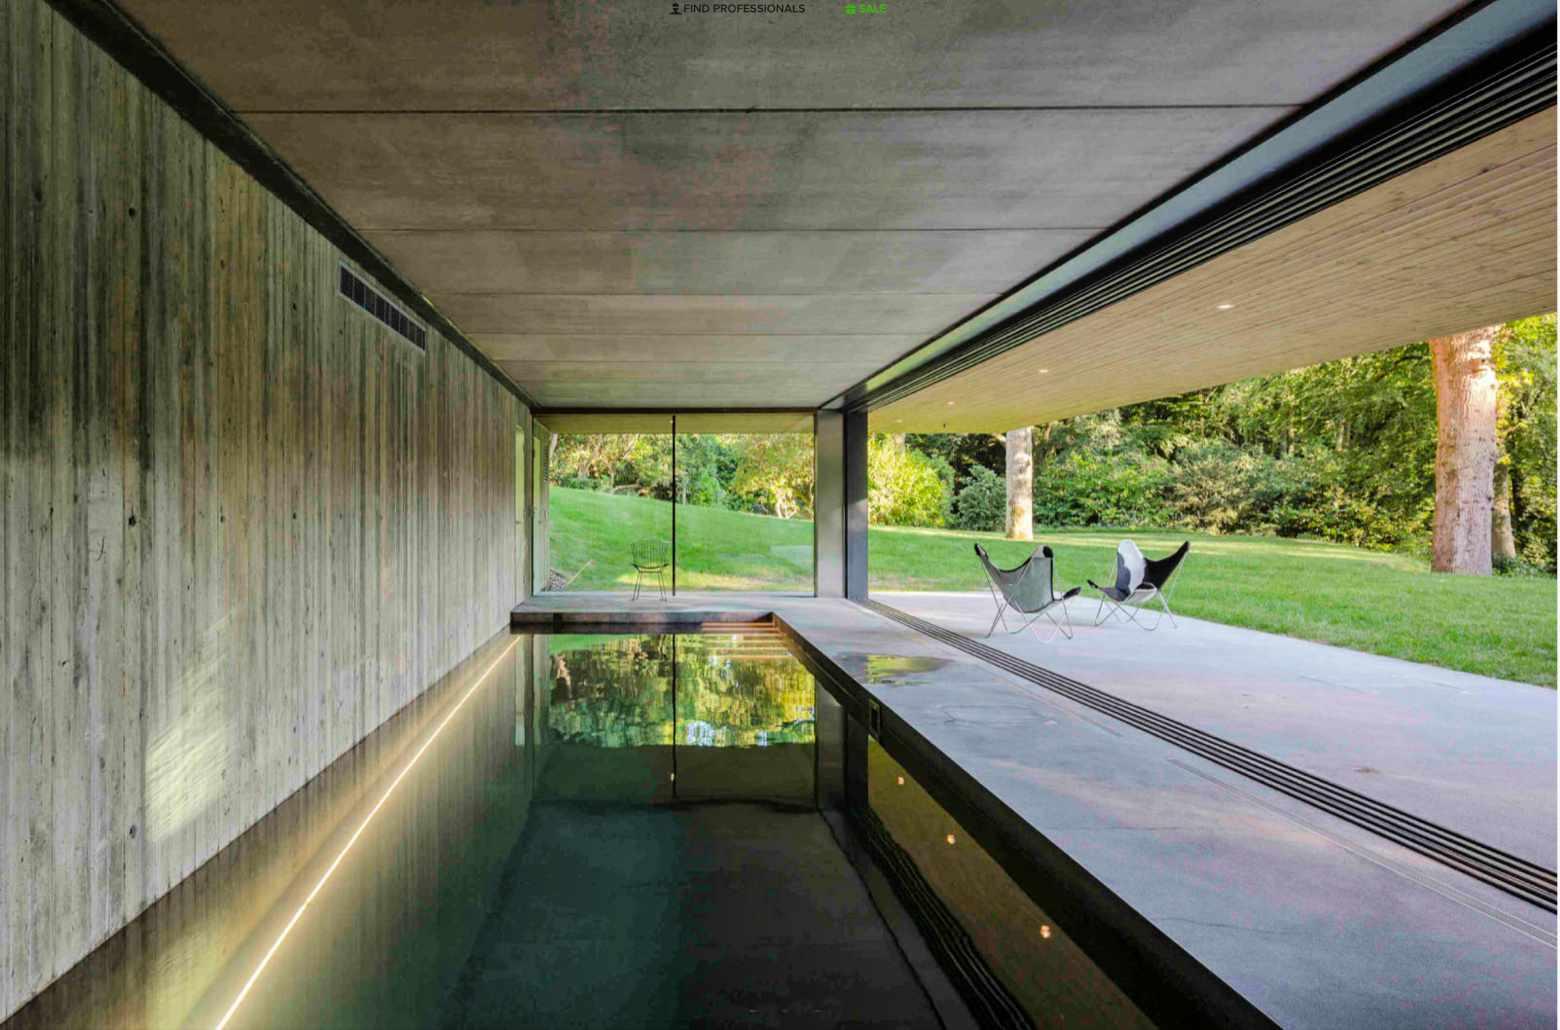 House at Red Bridge indoor swimming pool